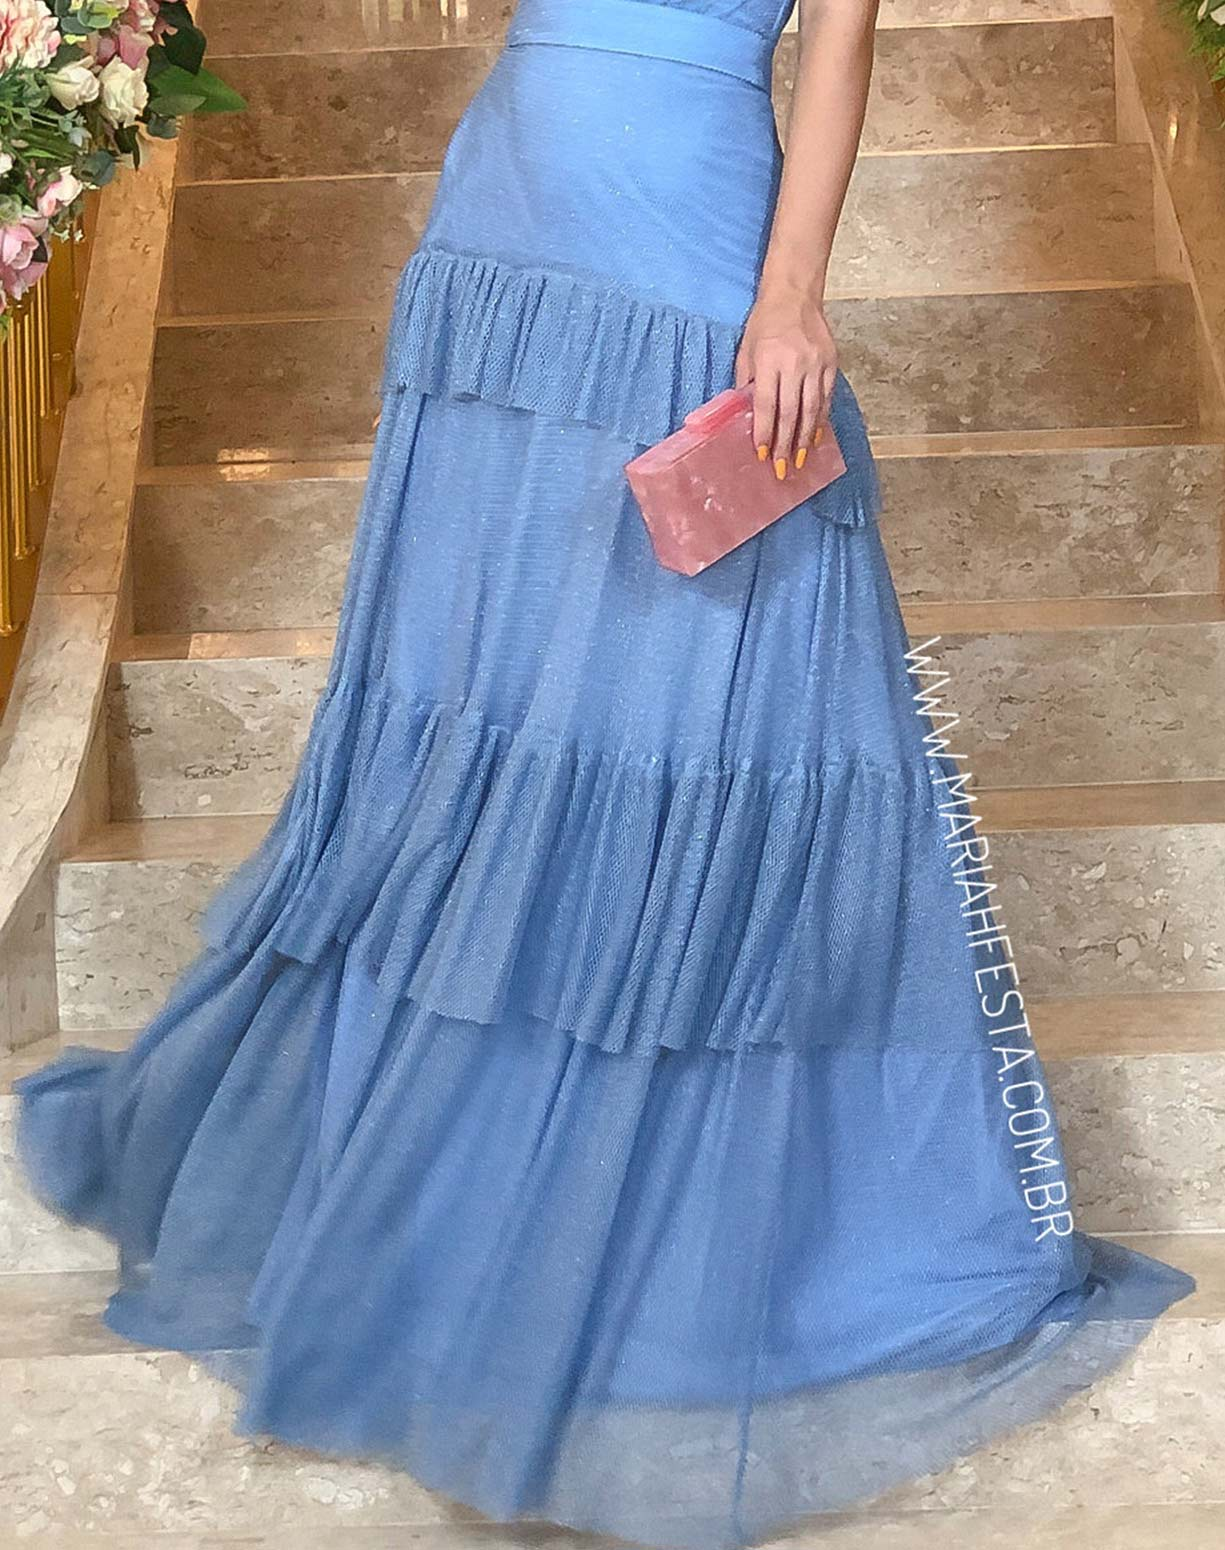 Vestido Azul Serenity em Tule Tela com Glitter